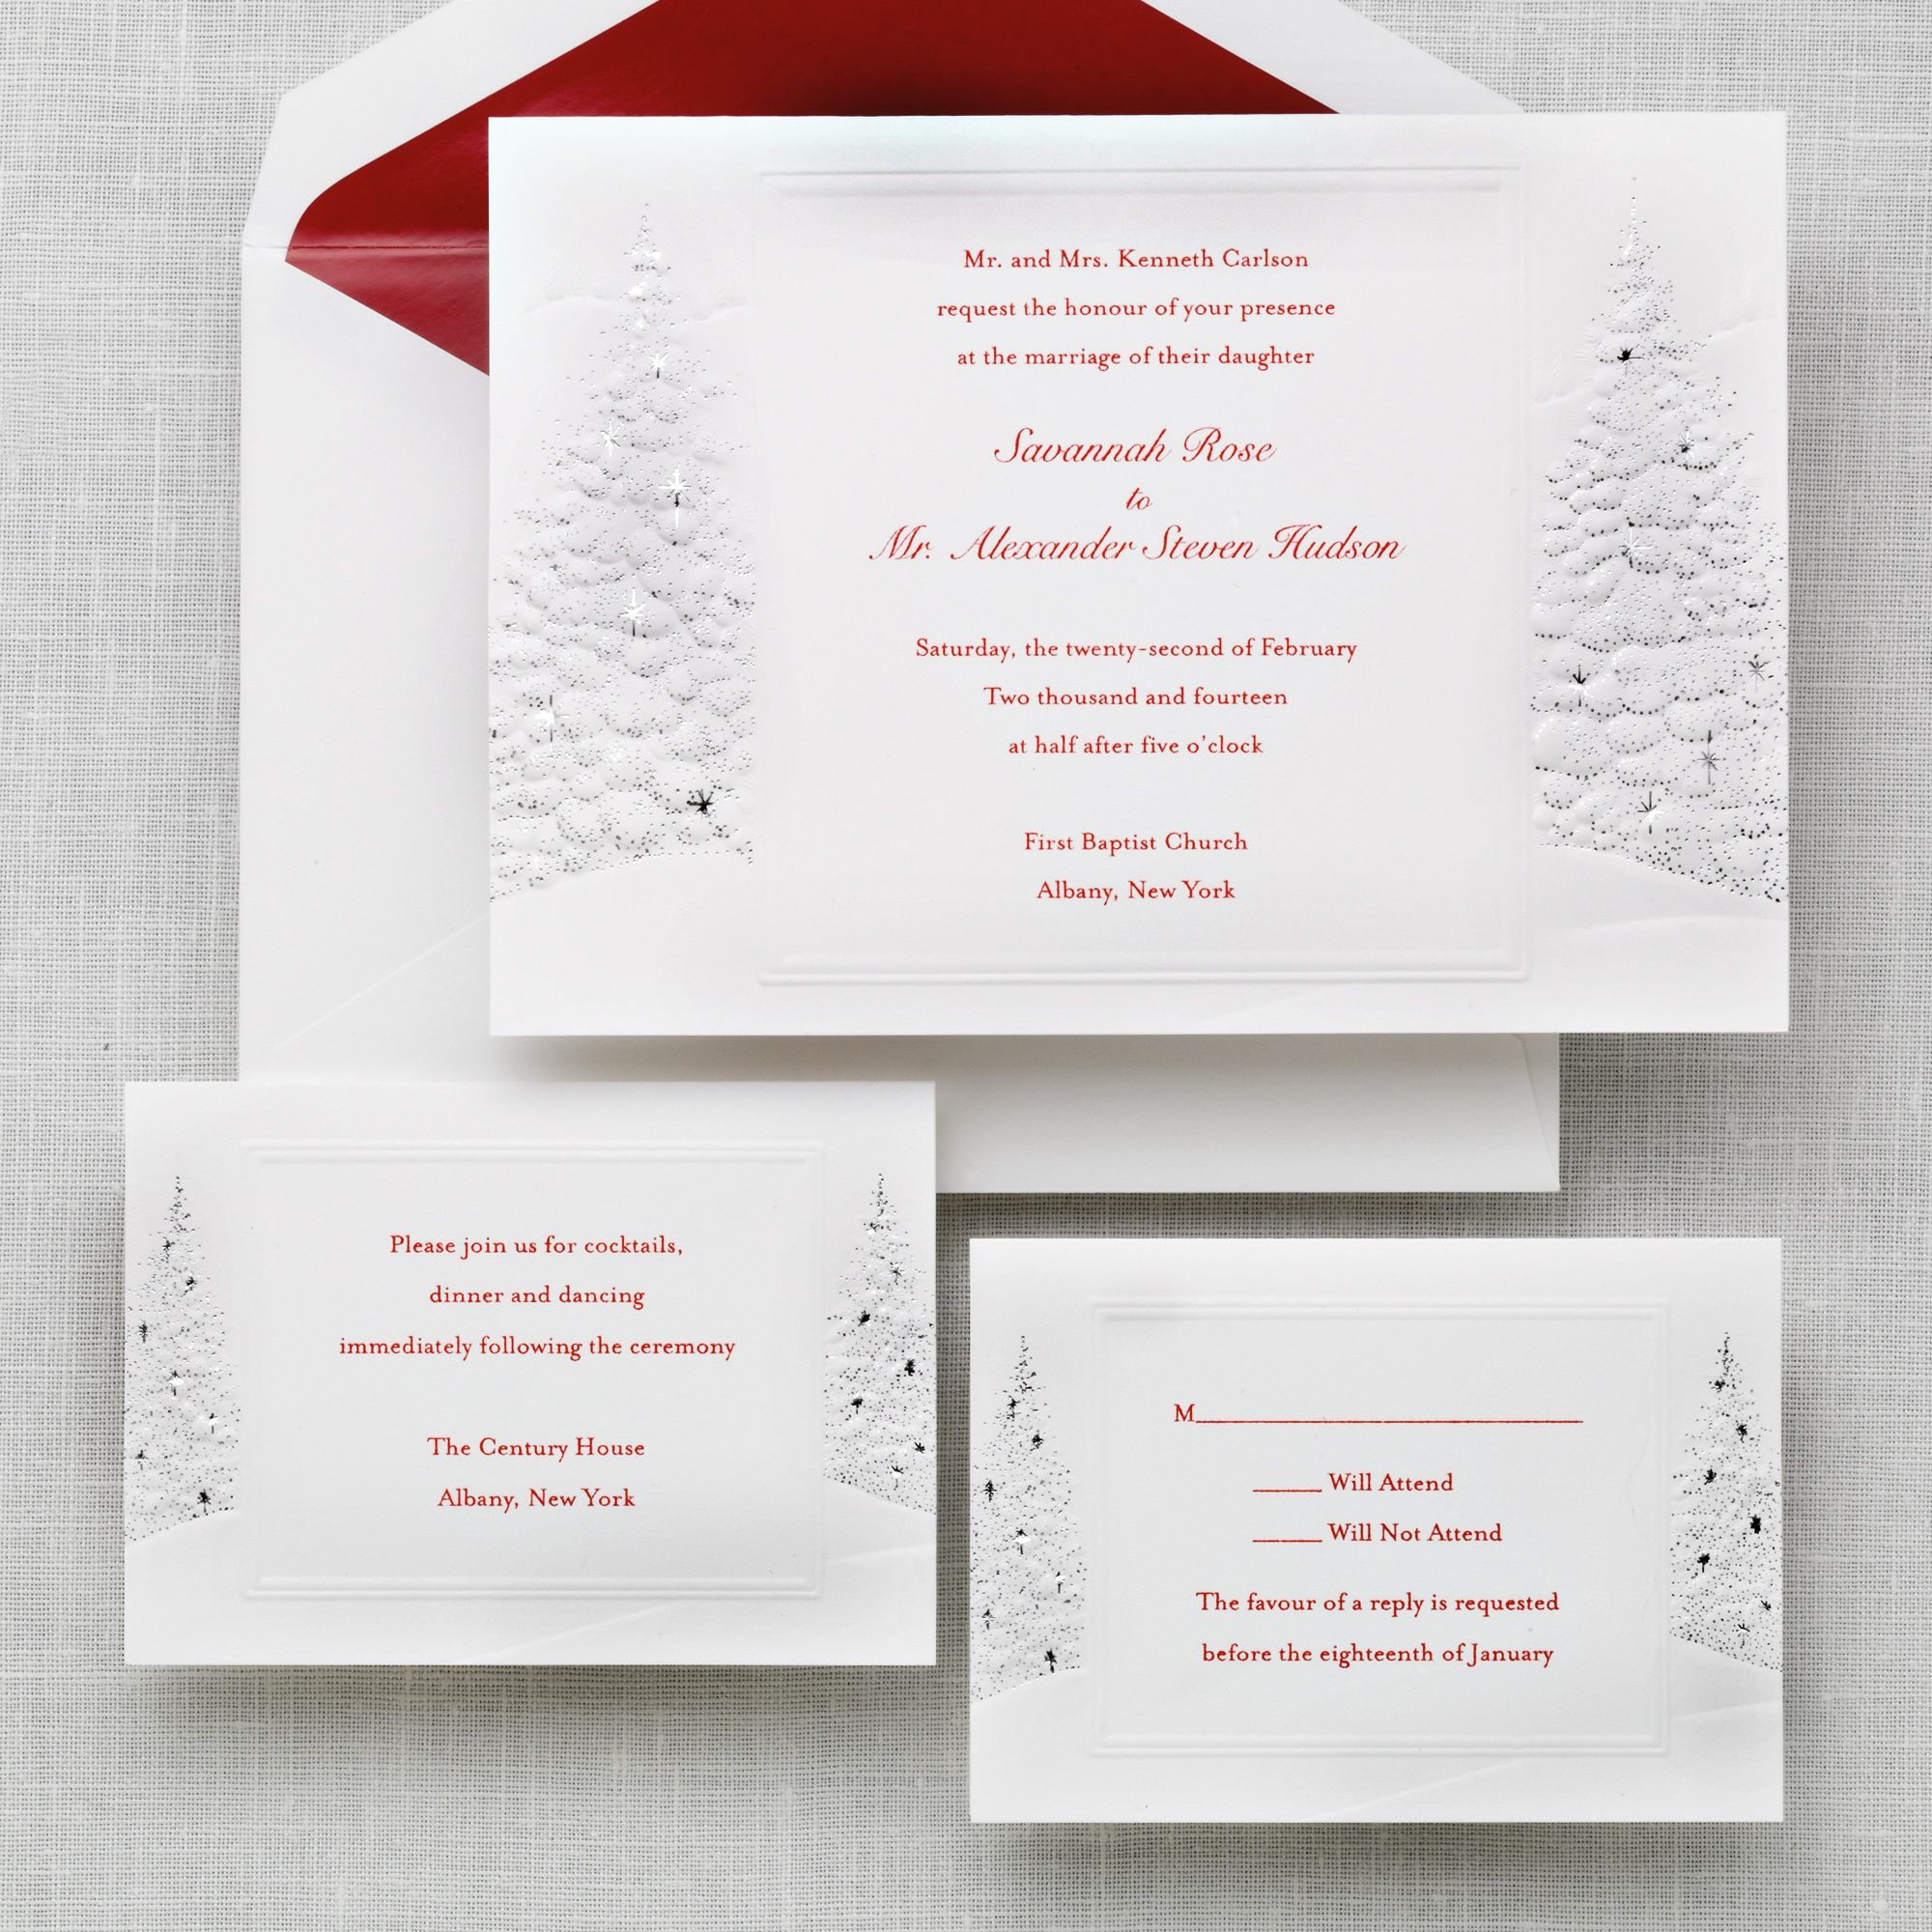 Winter Wedding Invitations Cheap: Winter's Romance Wedding Invitation